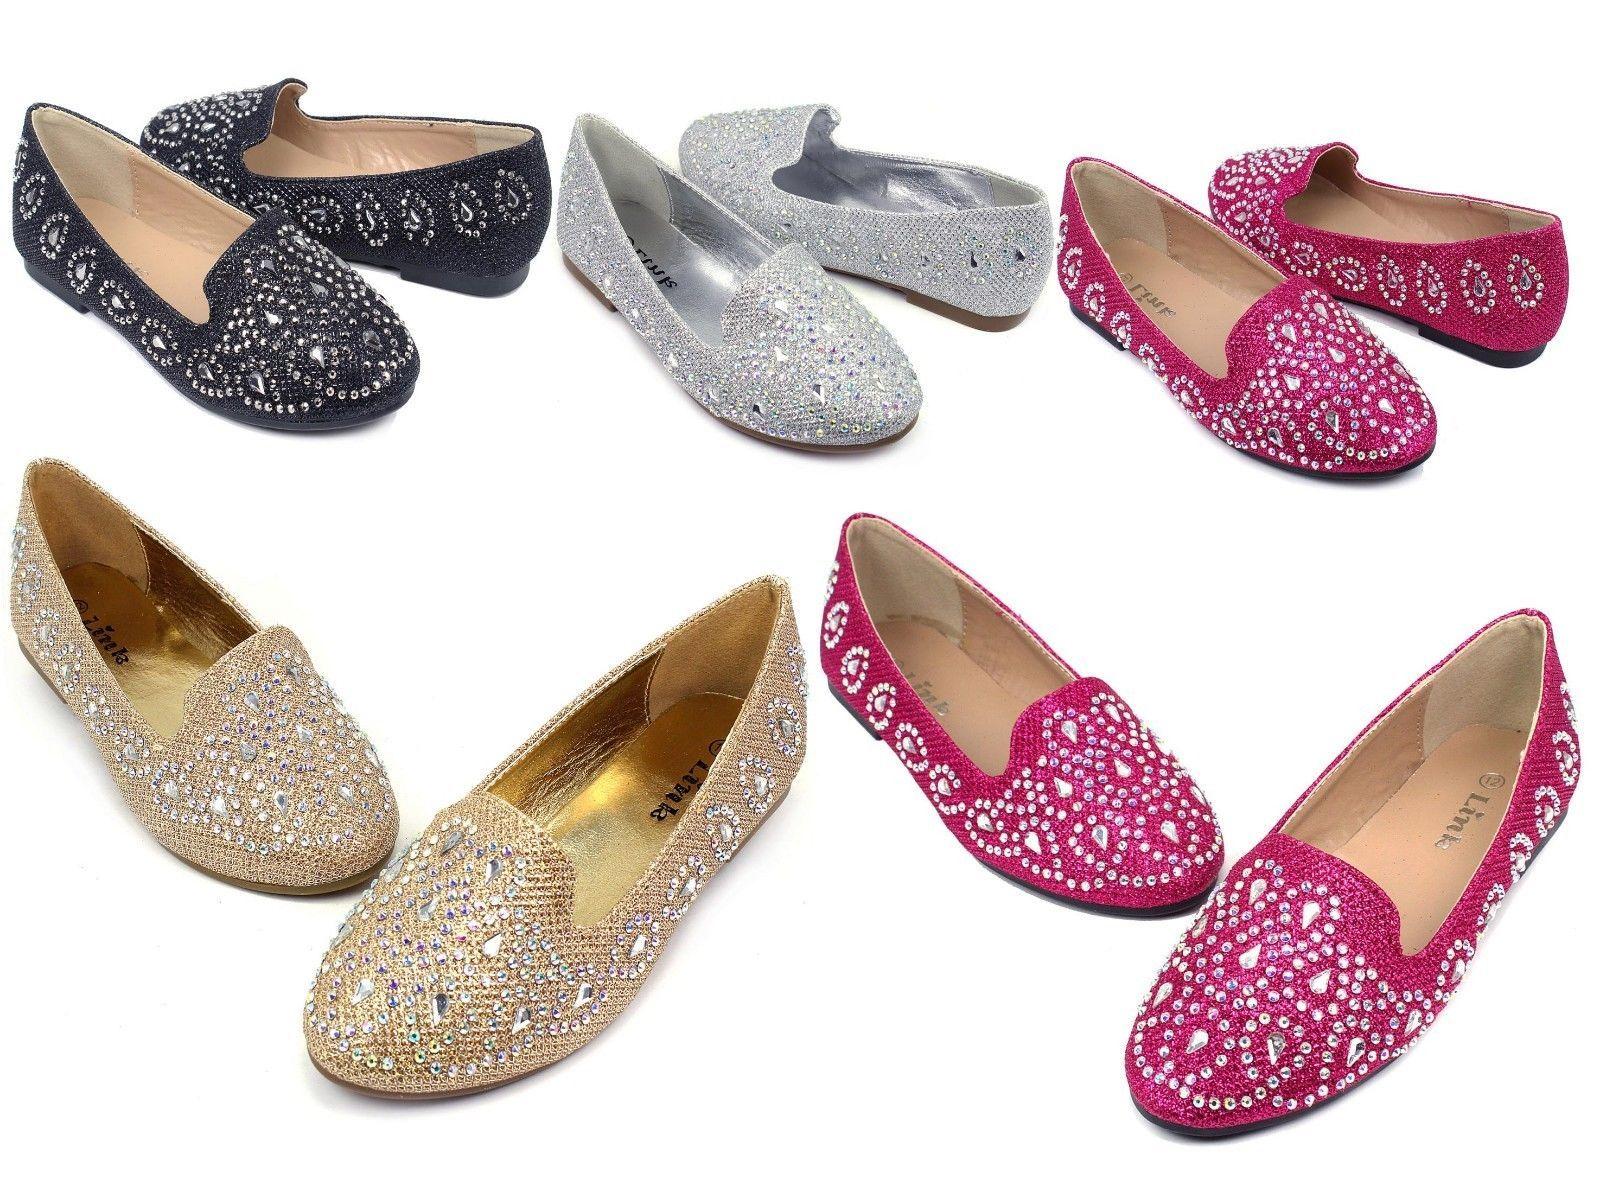 a11f09d2789  12.59 - Lonita-74K Kids Youth Blink Cute Flats Party Wedding Church Girl s  Shoes